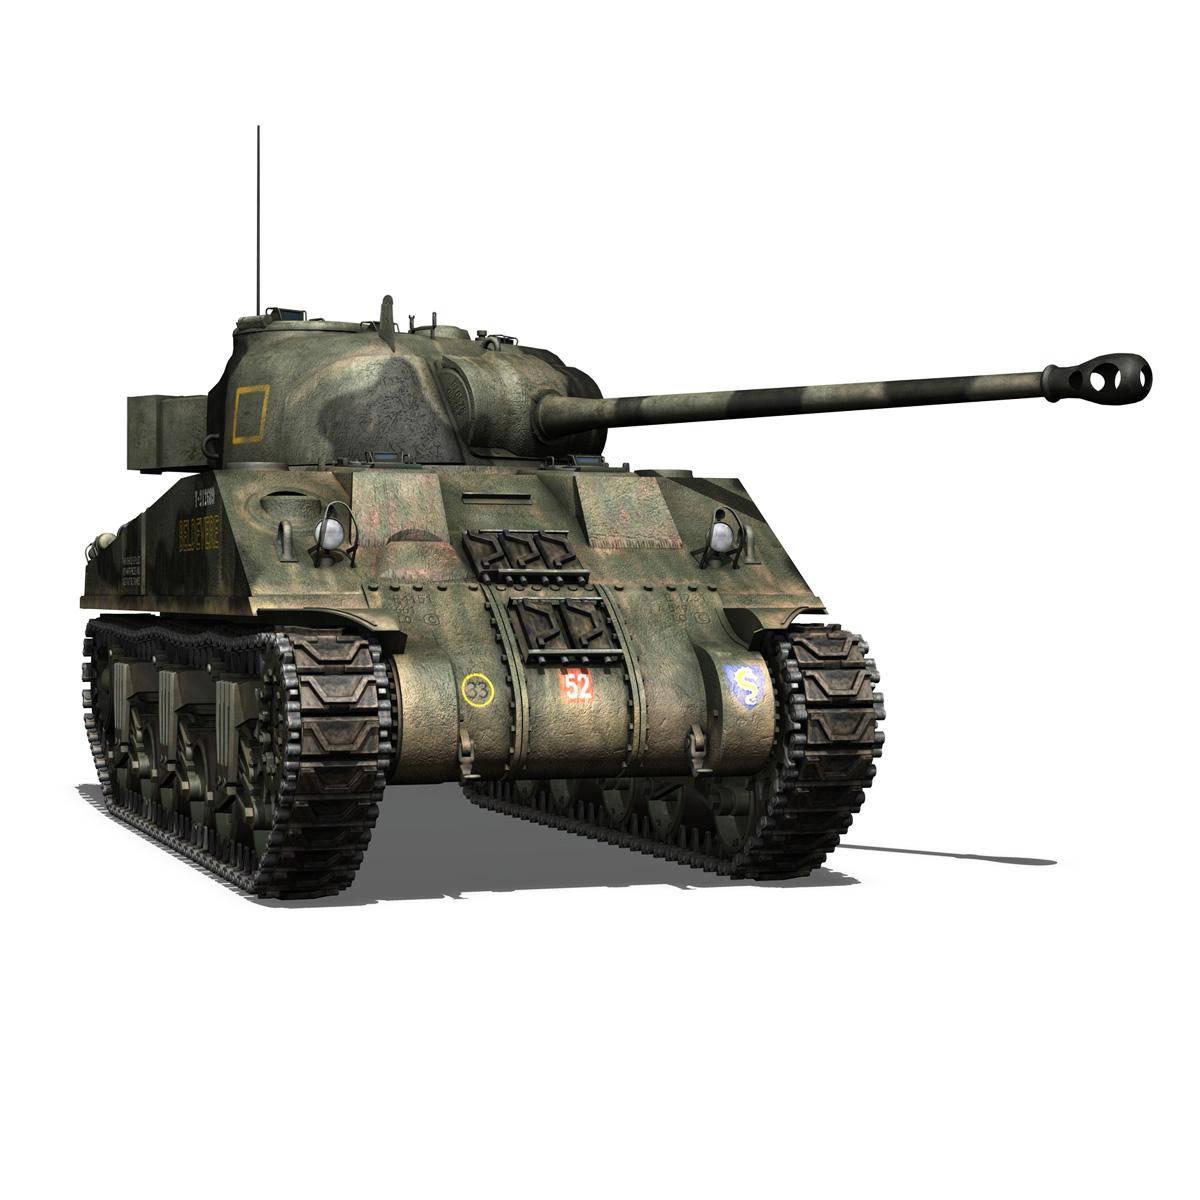 Sherman MK VC Firefly - Beldevere 3d model  266019